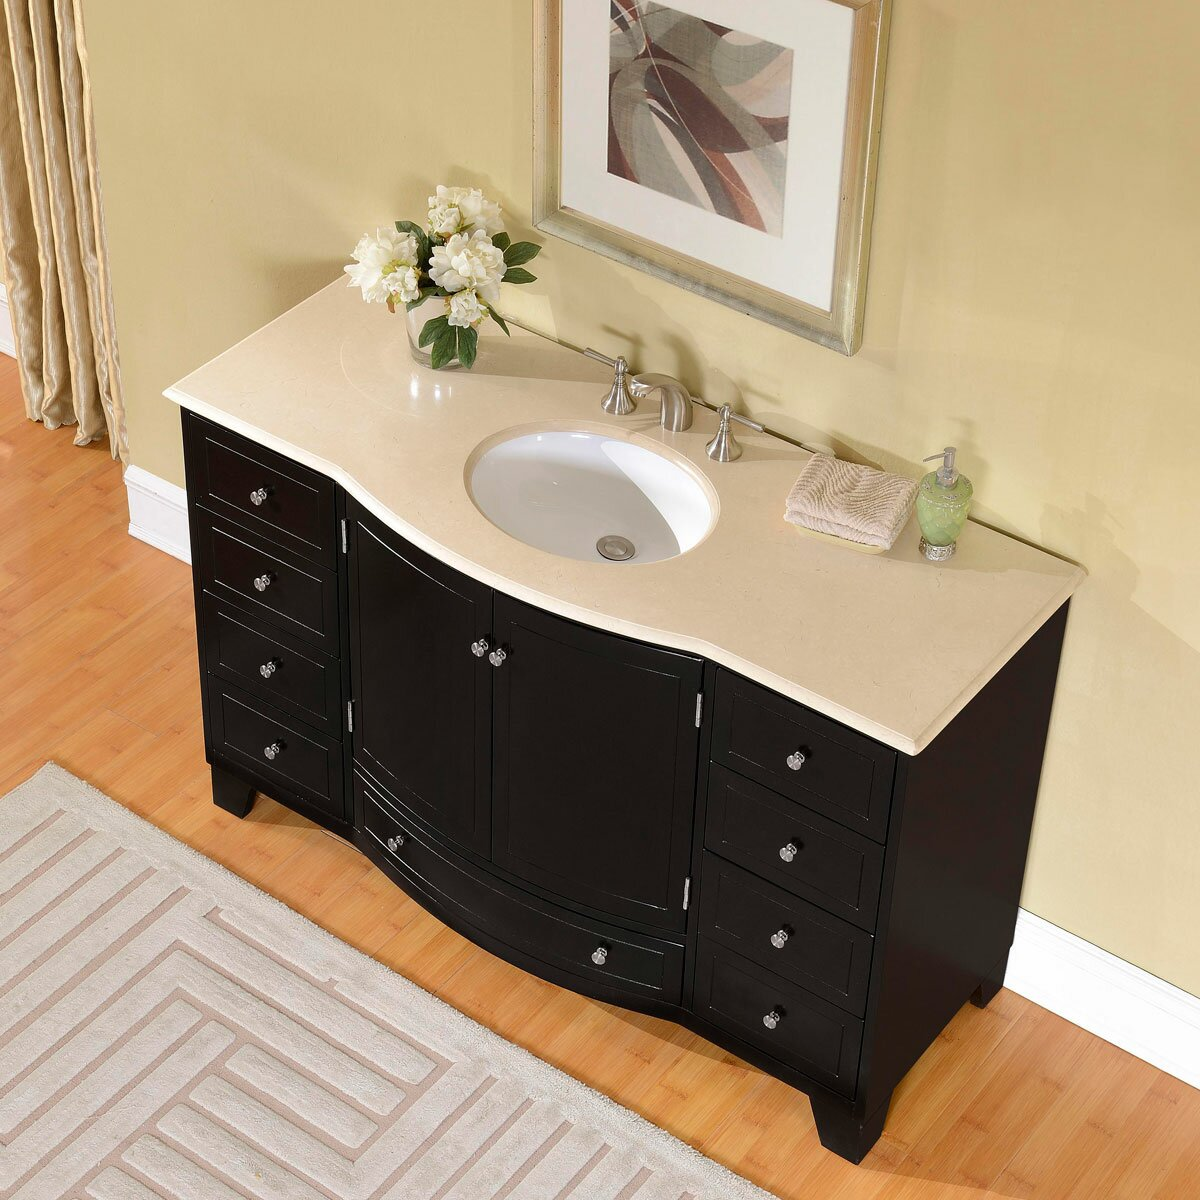 Bathroom single sink cabinets - Silkroad Exclusive 55 Quot Single Sink Cabinet Bathroom Vanity Set